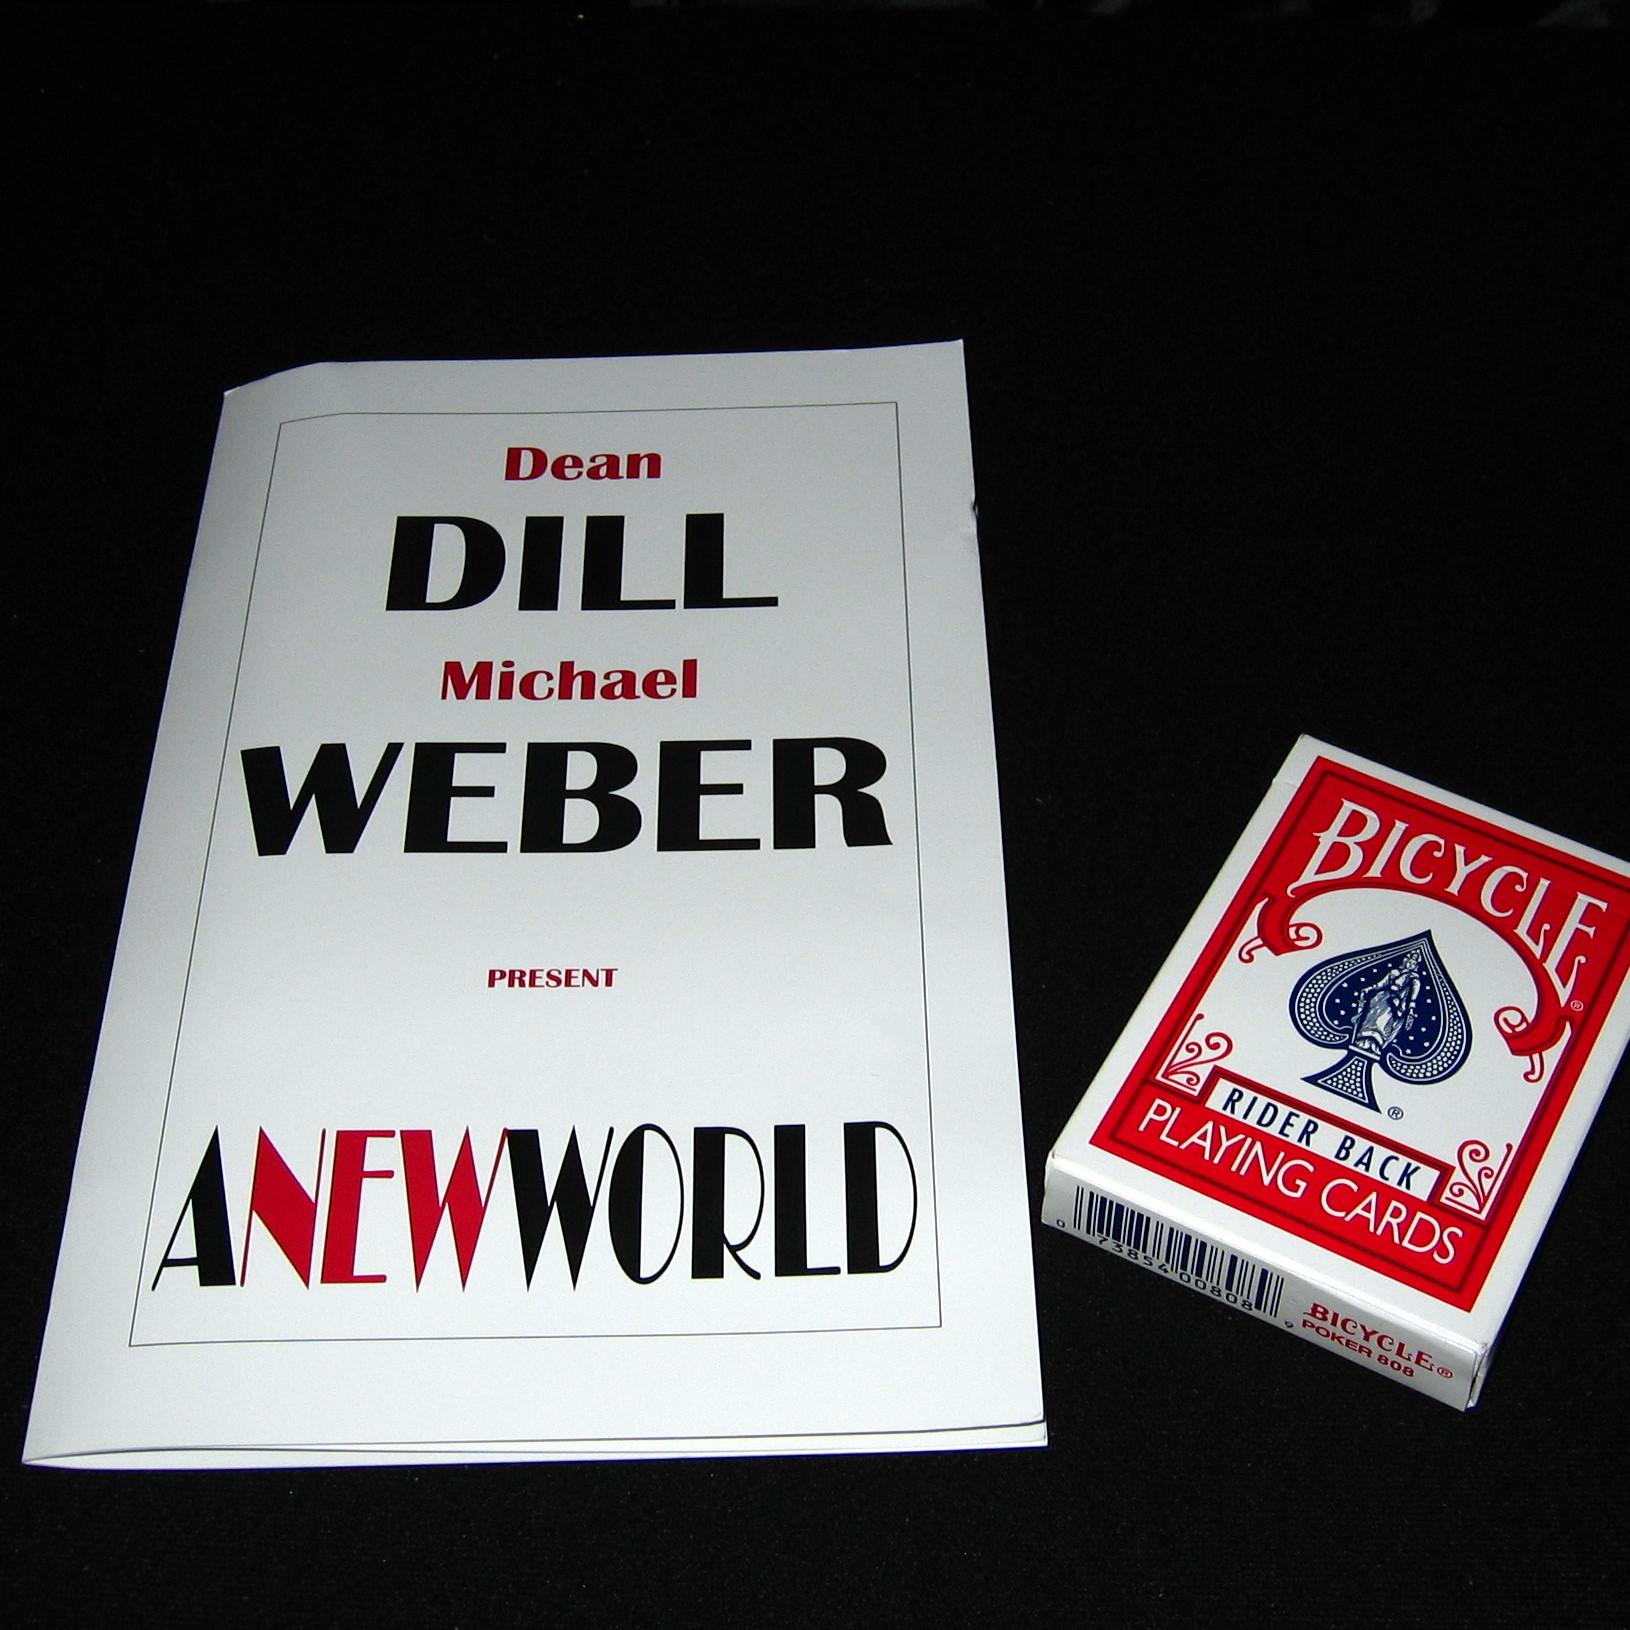 A New World by Dean Dill, Michael Weber